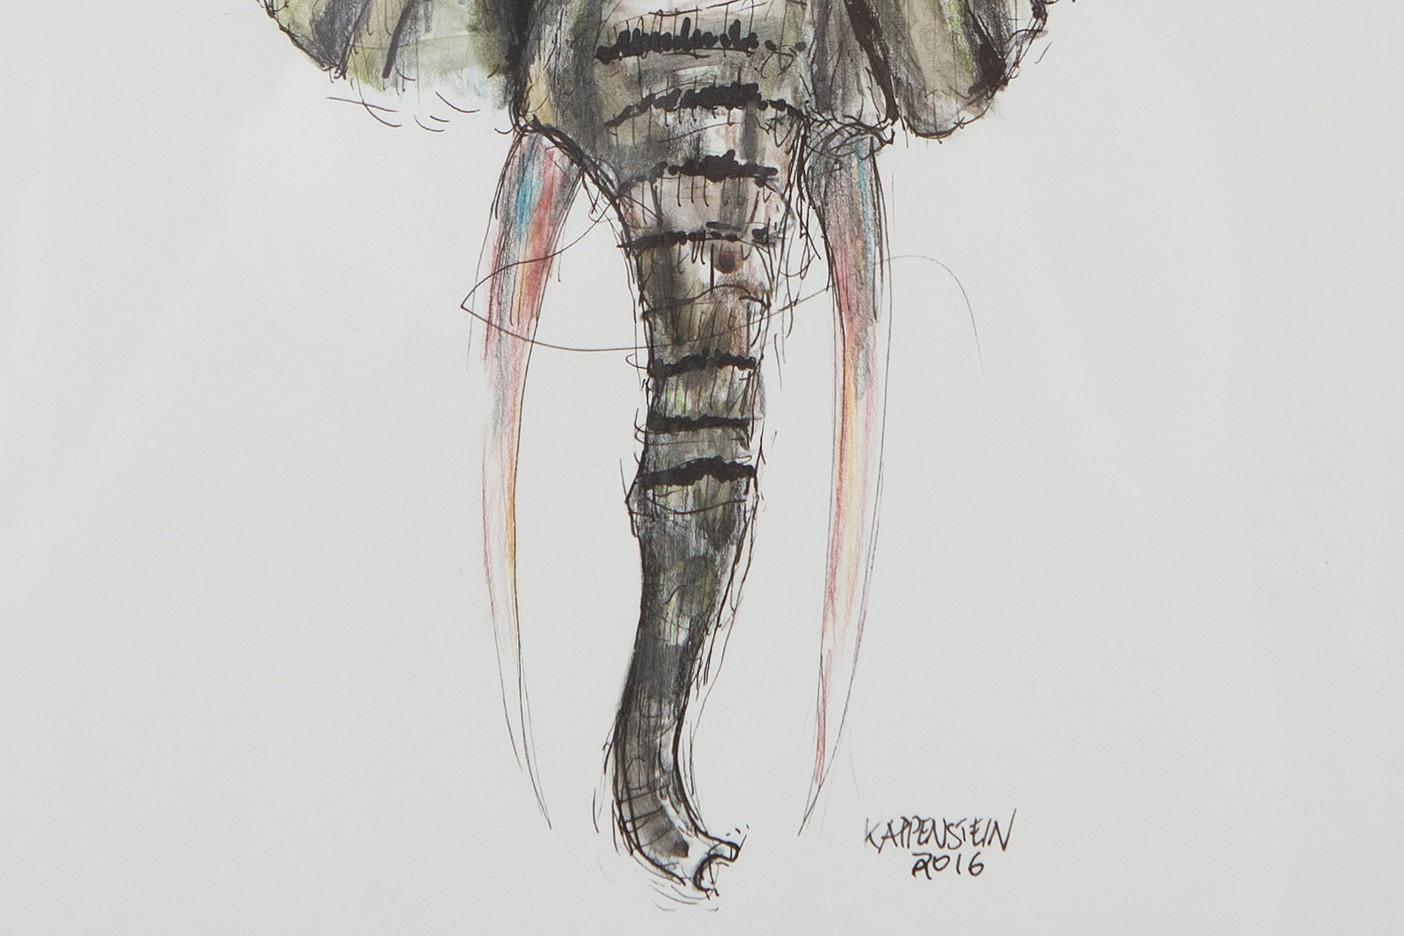 Elektrofant